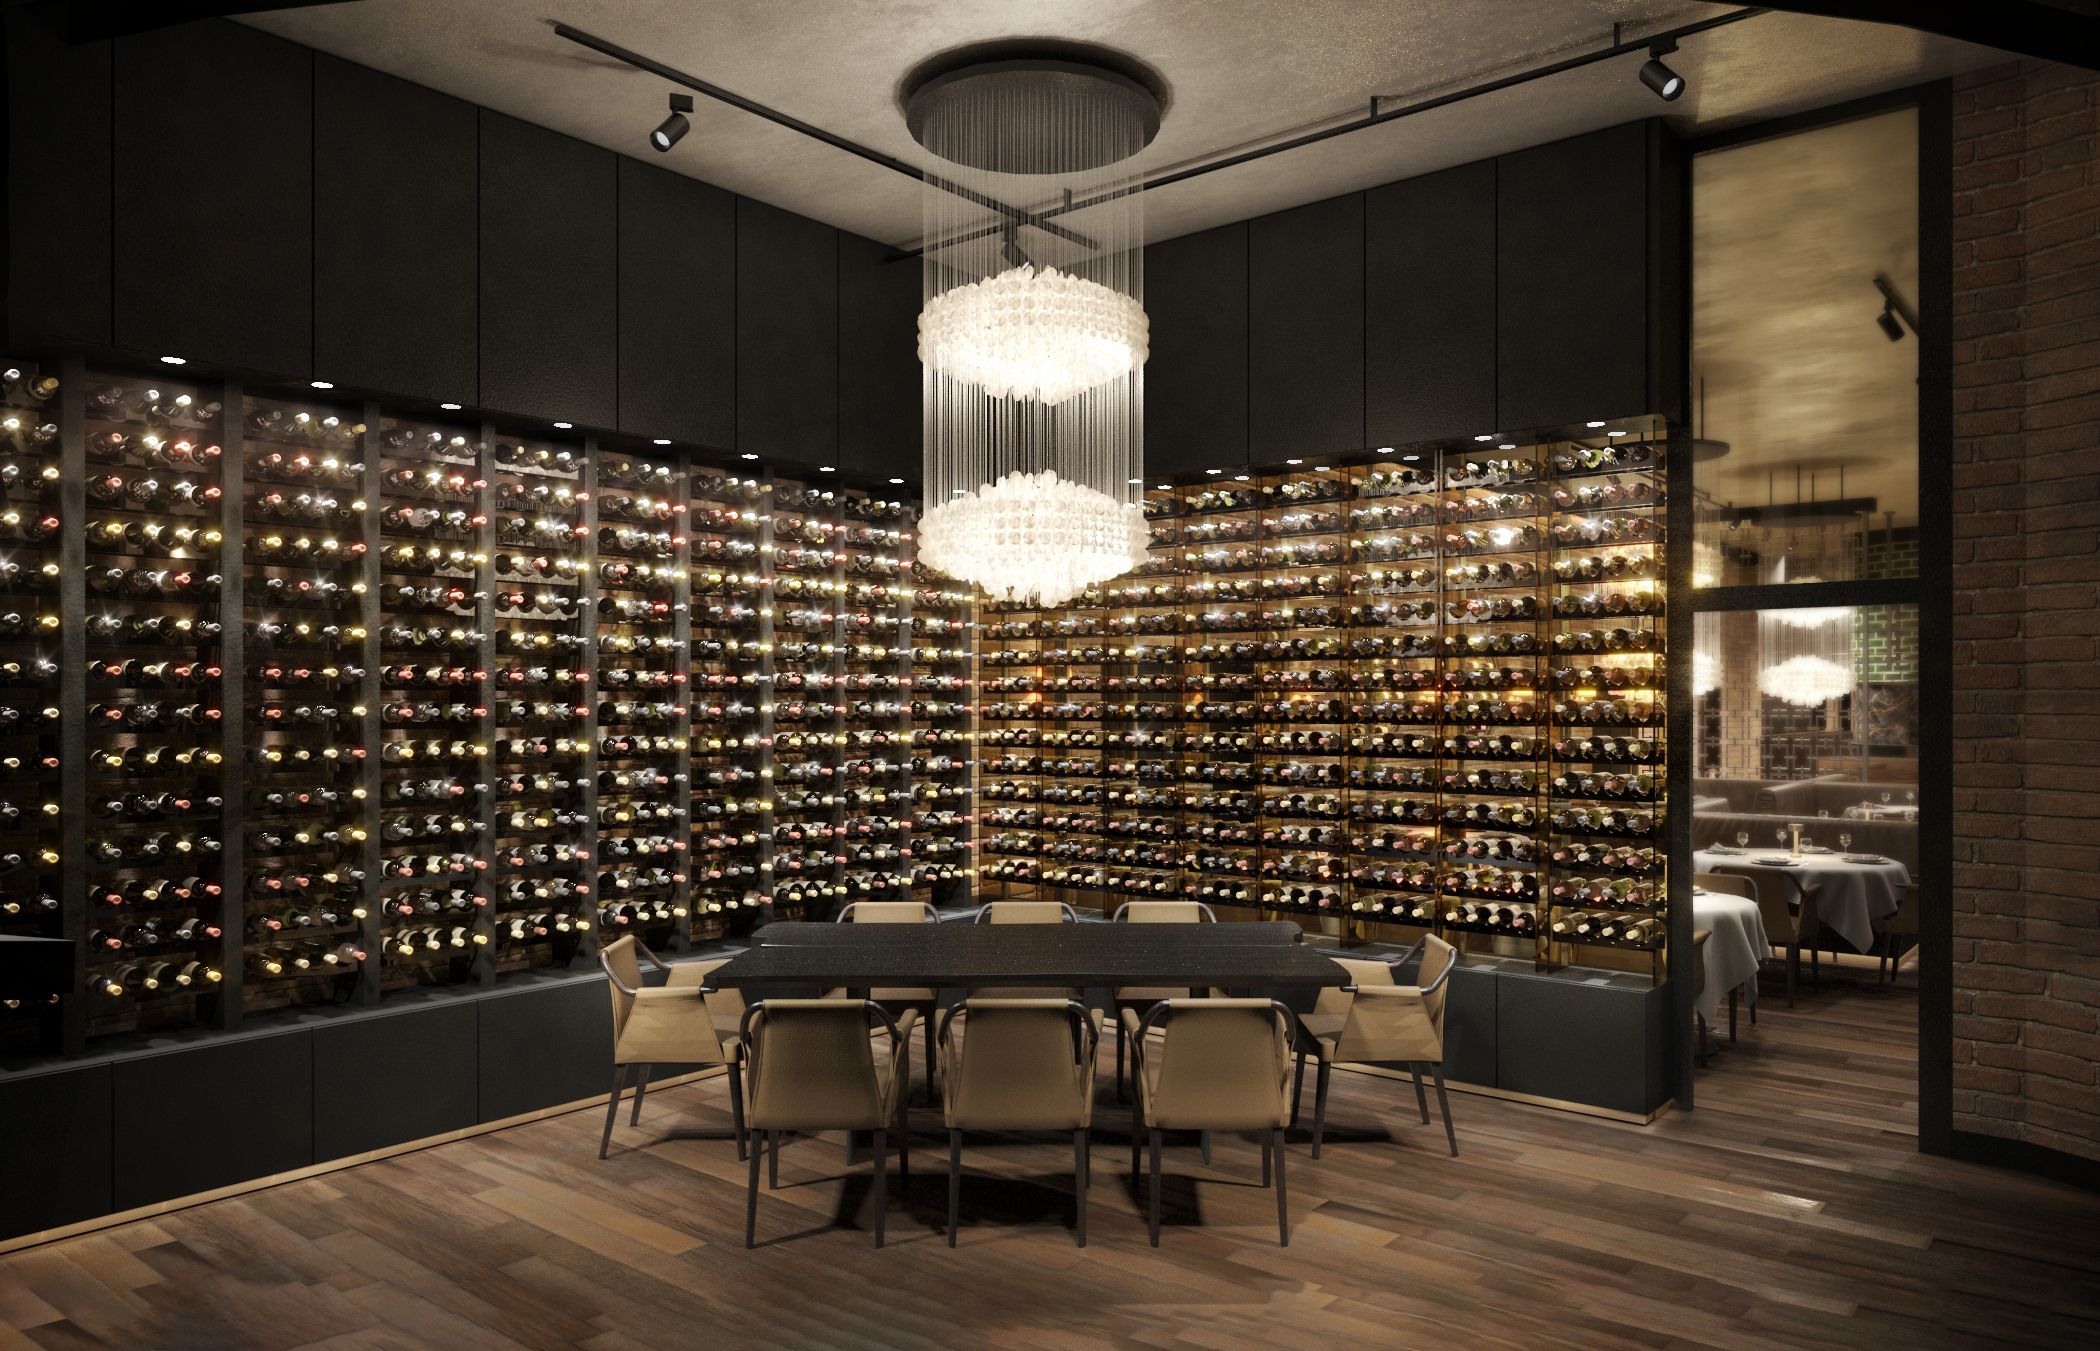 https://martinuzzi.ch/wp-content/uploads/2019/12/Doppio_gusto_restaurant_wine_cellar_1.jpg